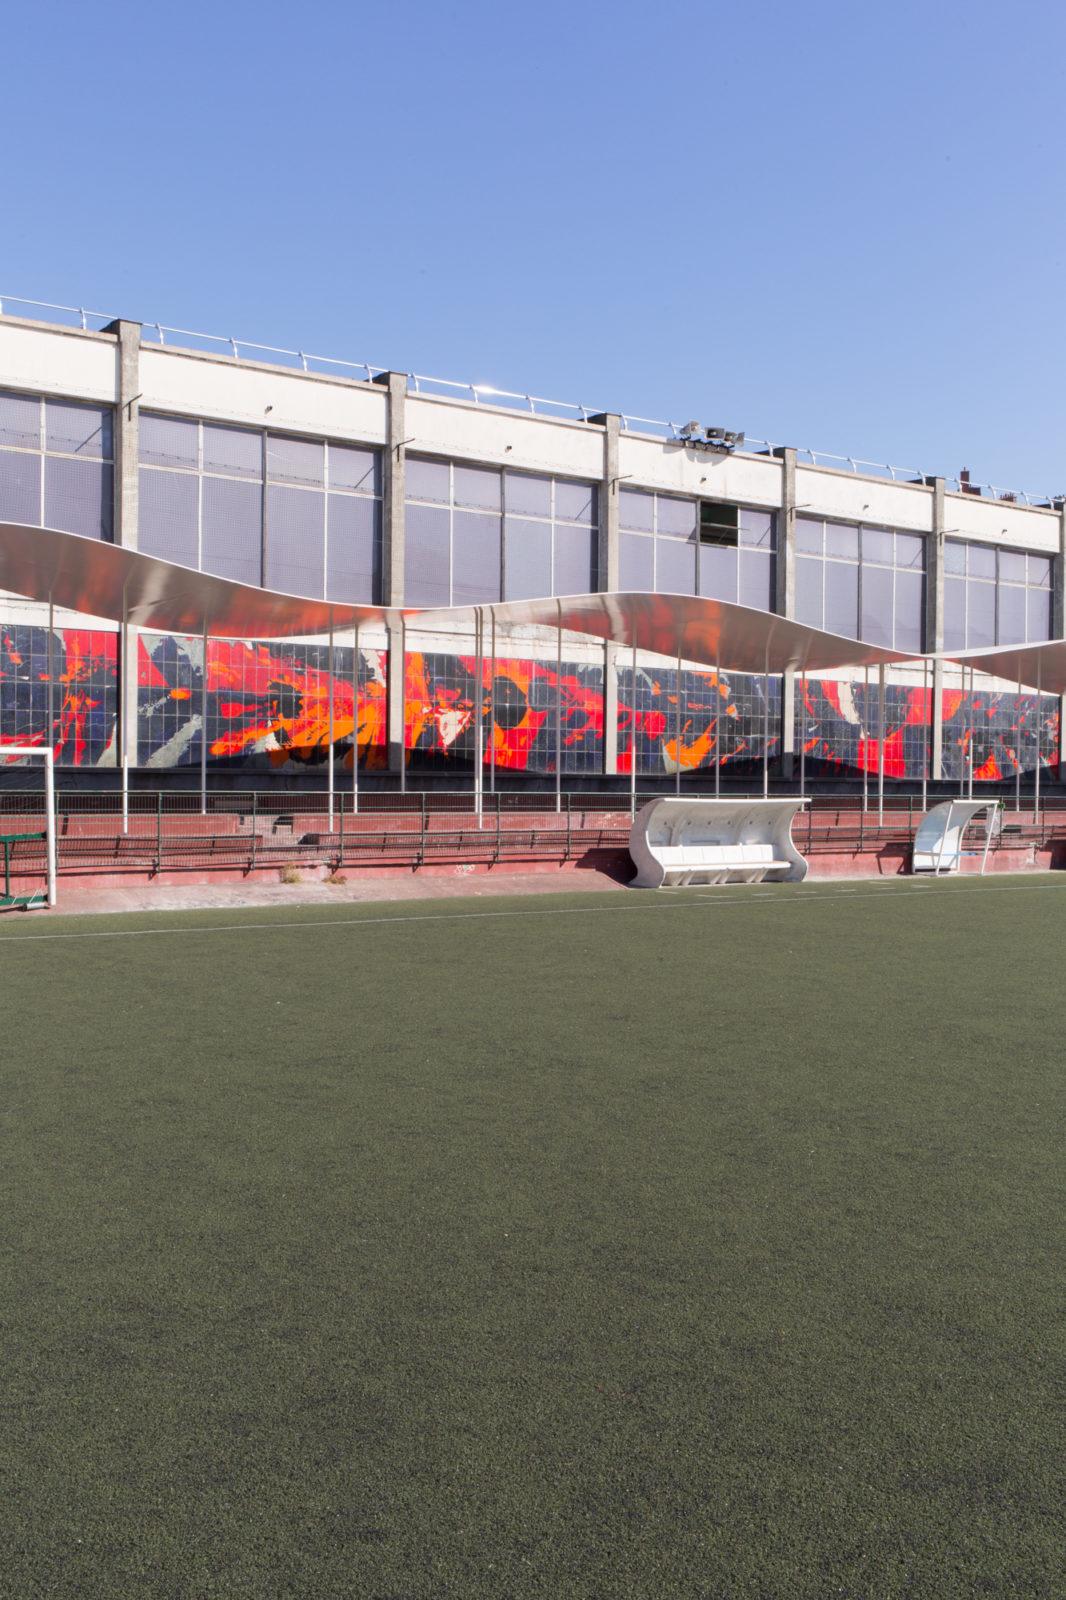 Severine-stade-auventsept-ld-42